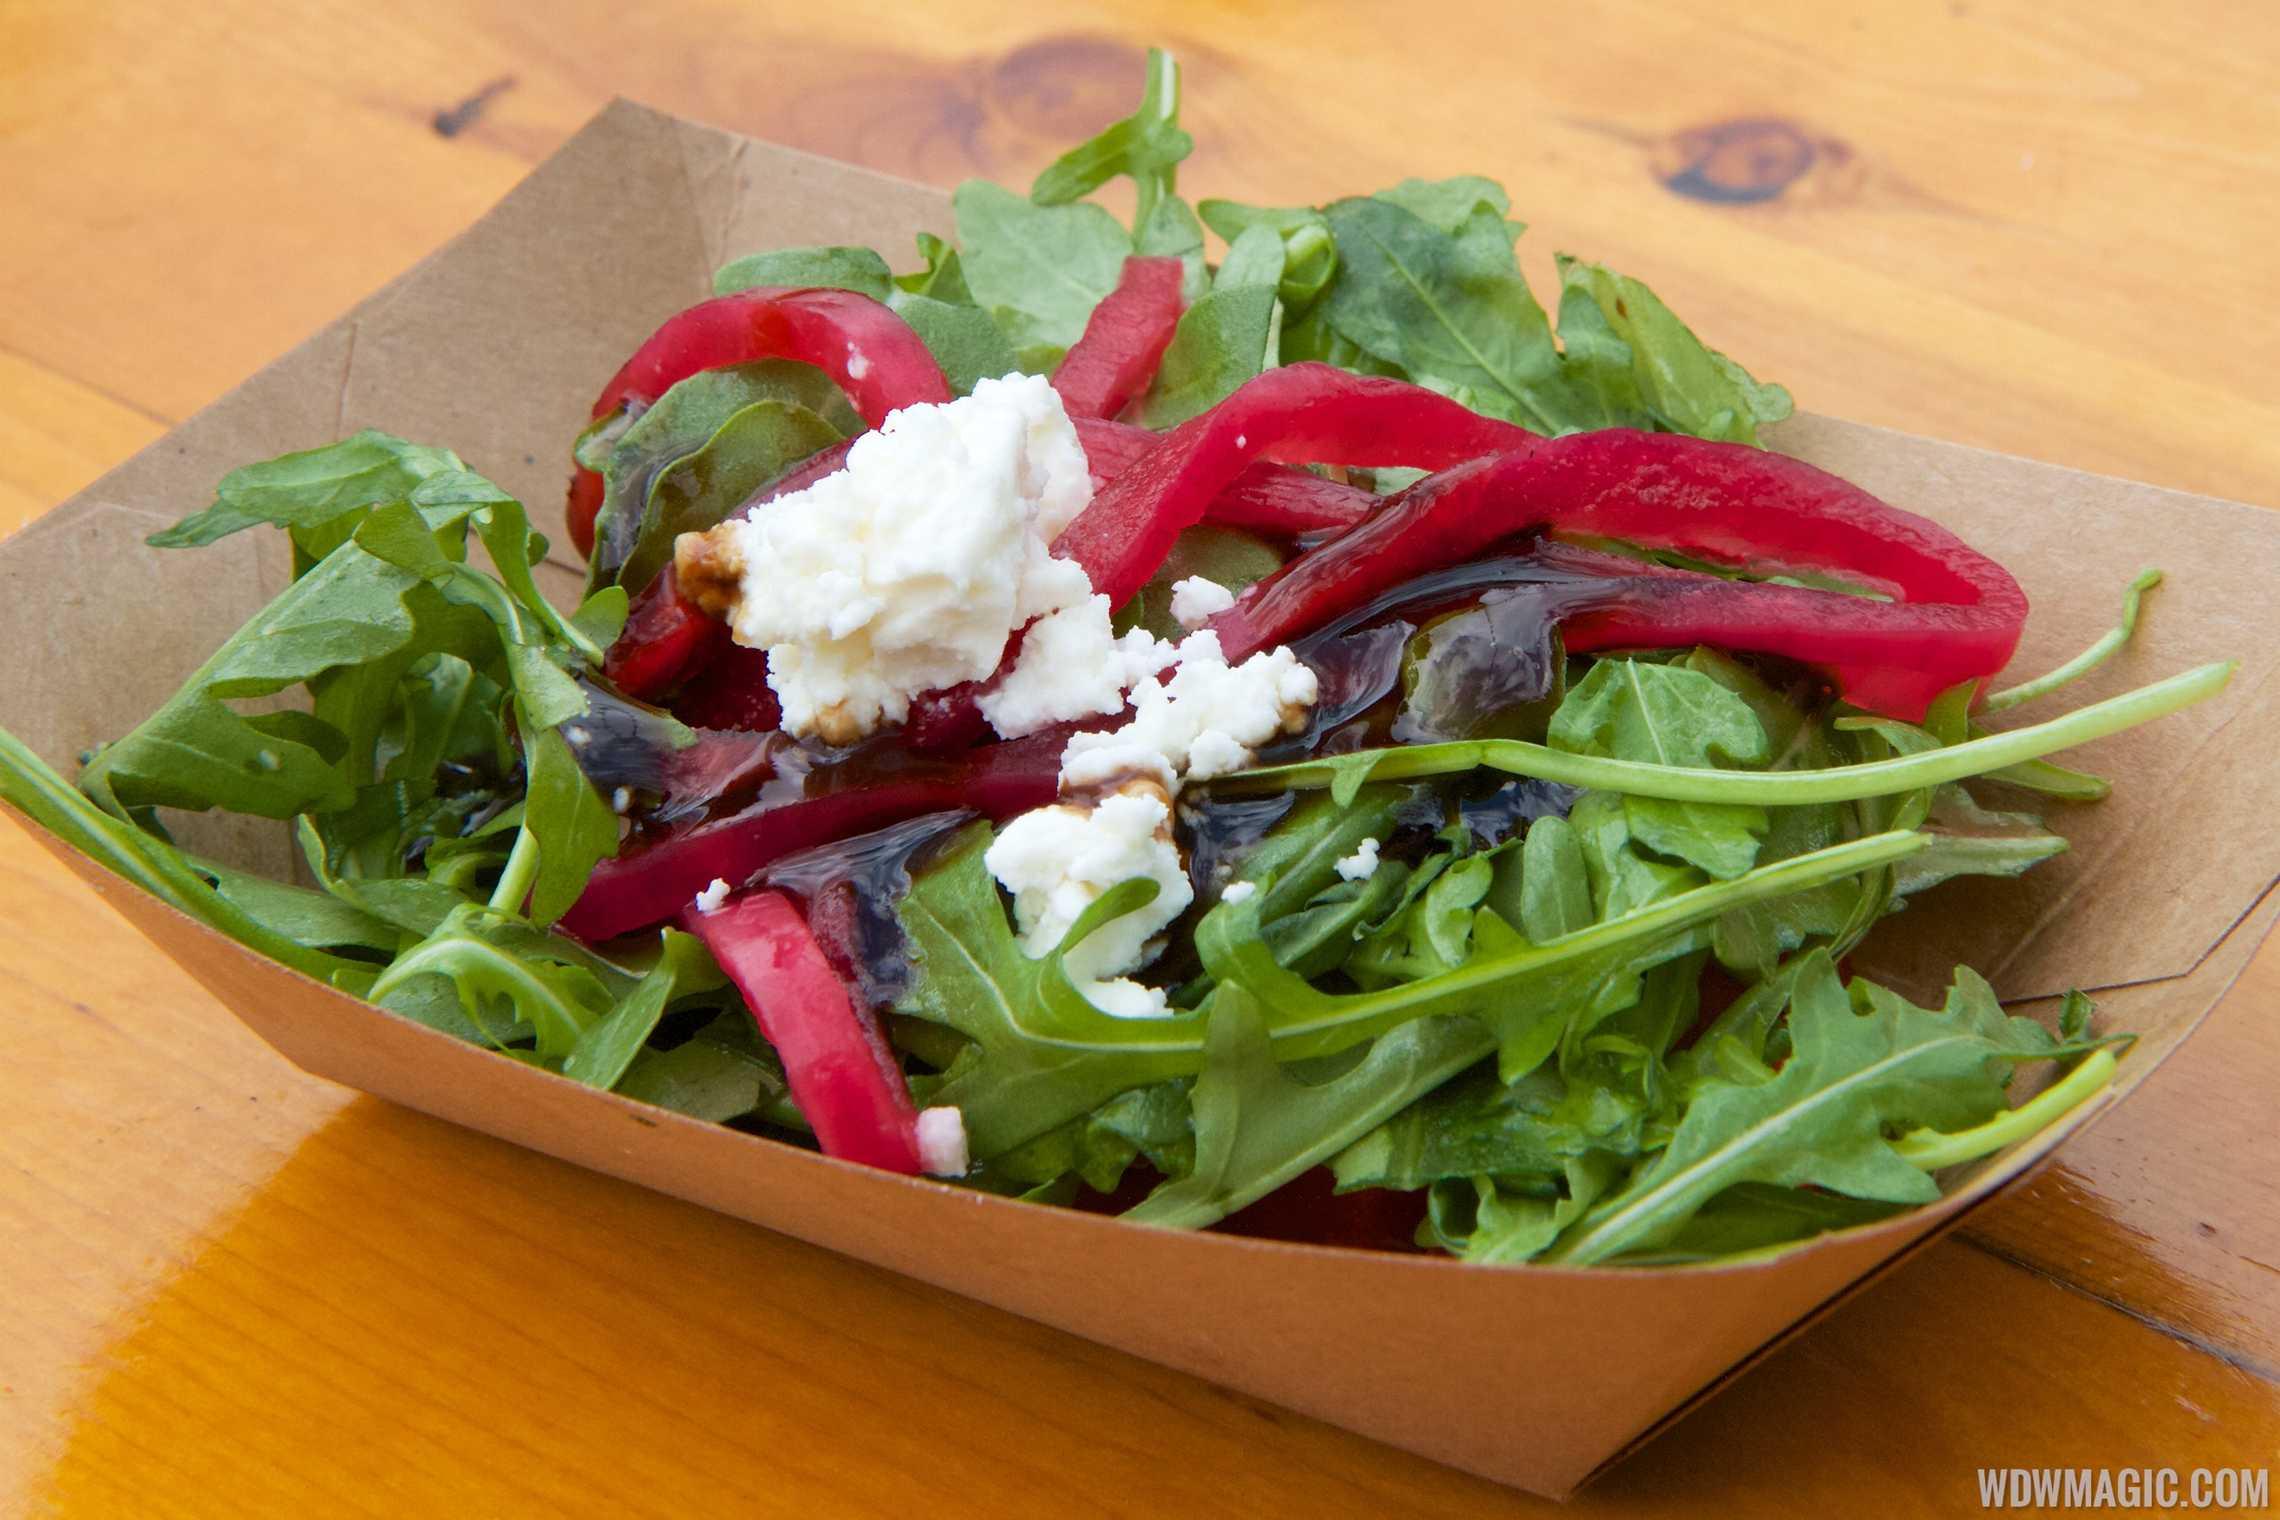 2014 Epcot Flower and Garden Festival Outdoor Kitchen kiosk - Florida Fresh - Watermelon Salad $3.50